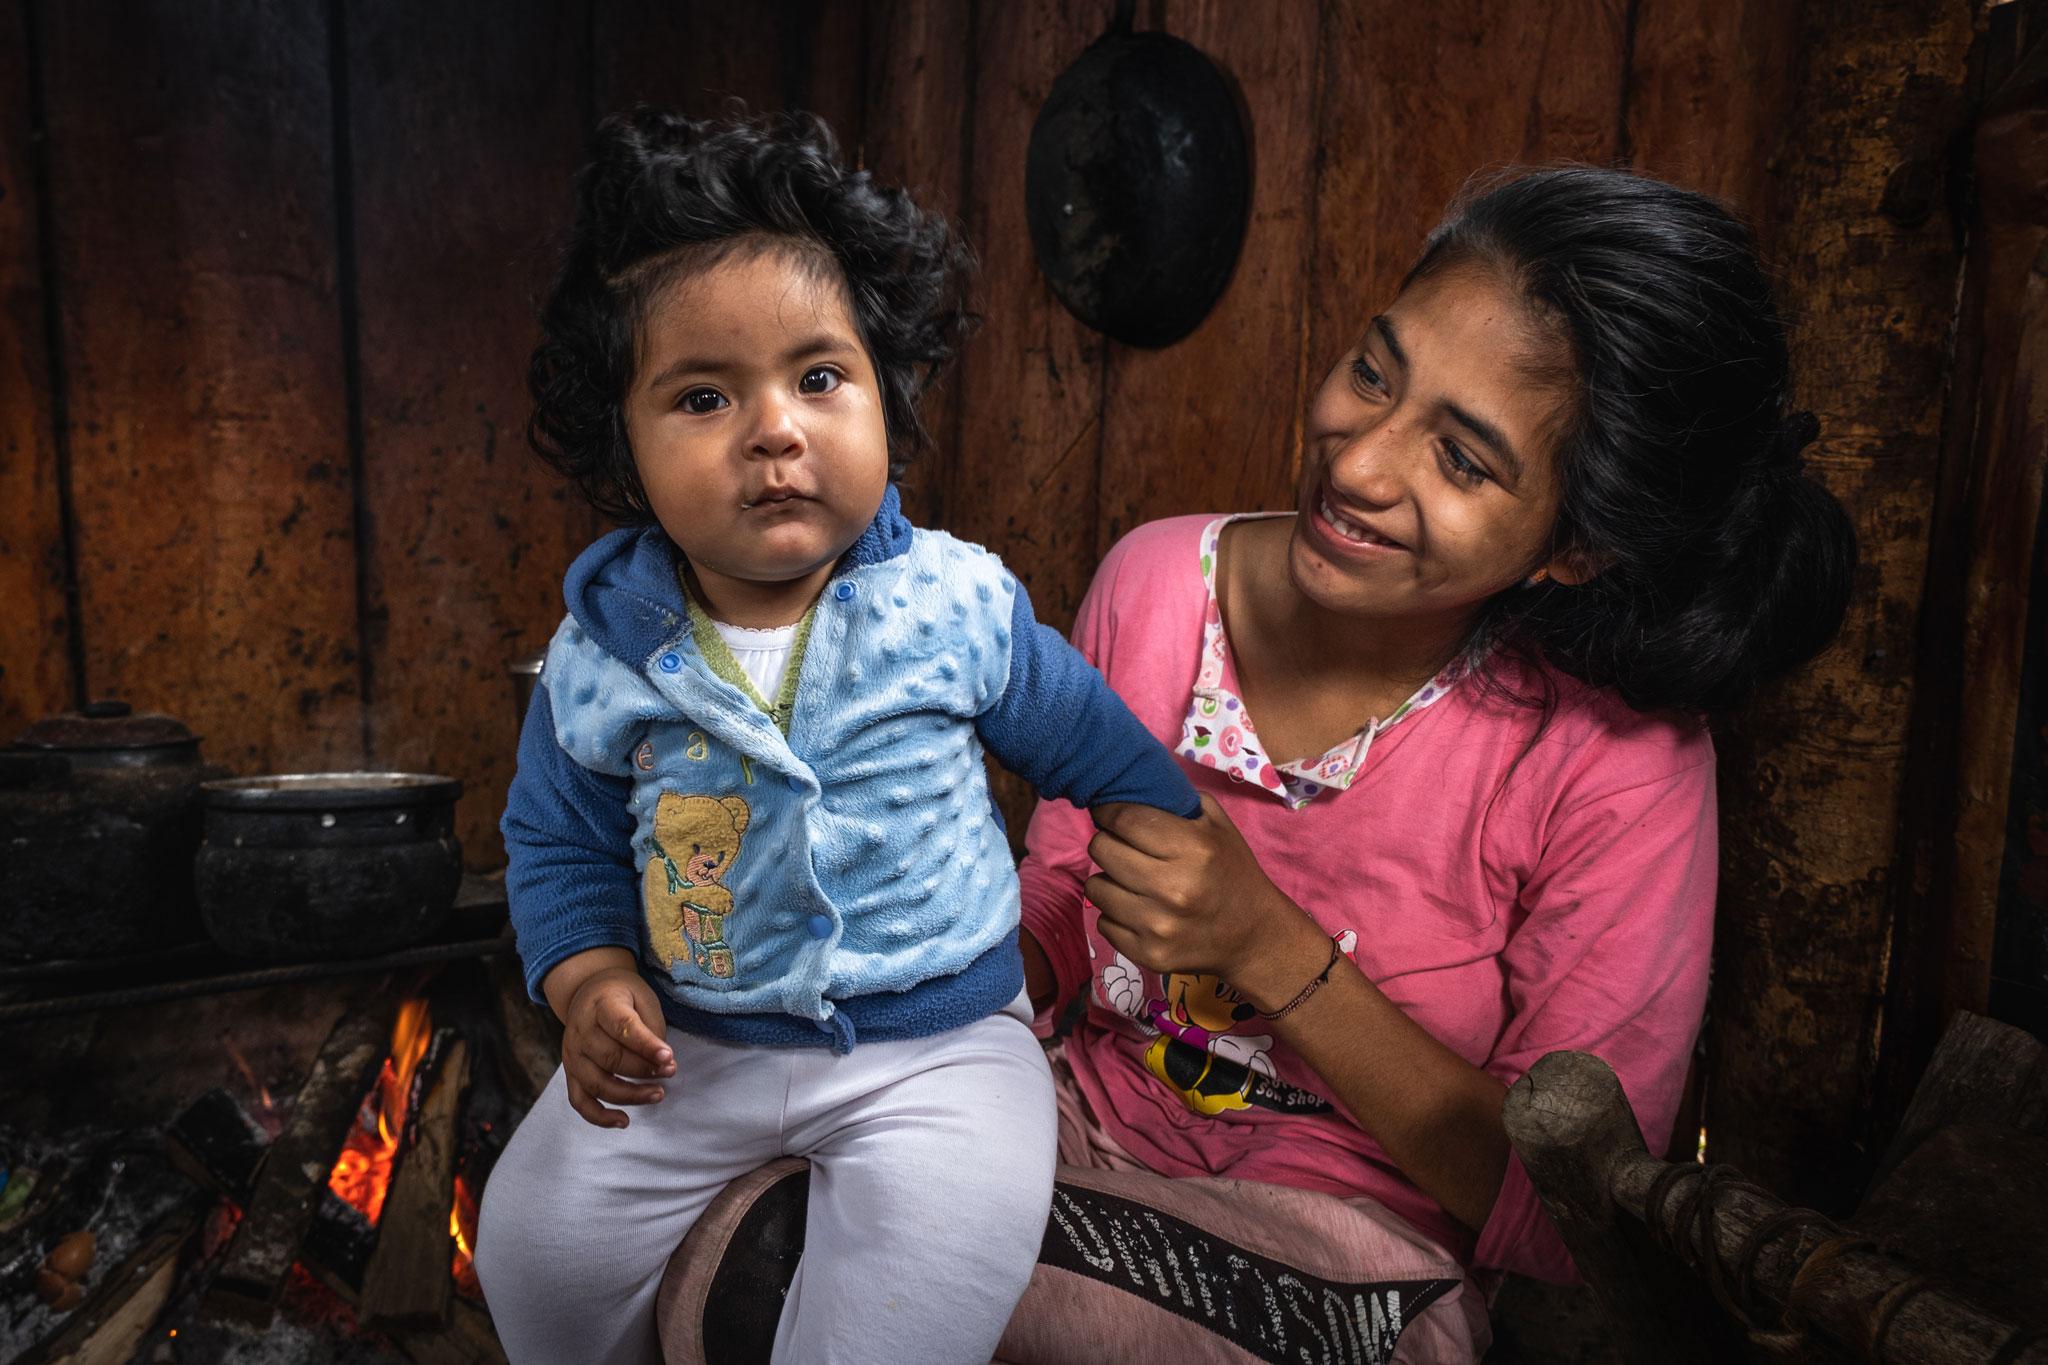 gabriela-proud-of-her-baby-llaqtapata-peru